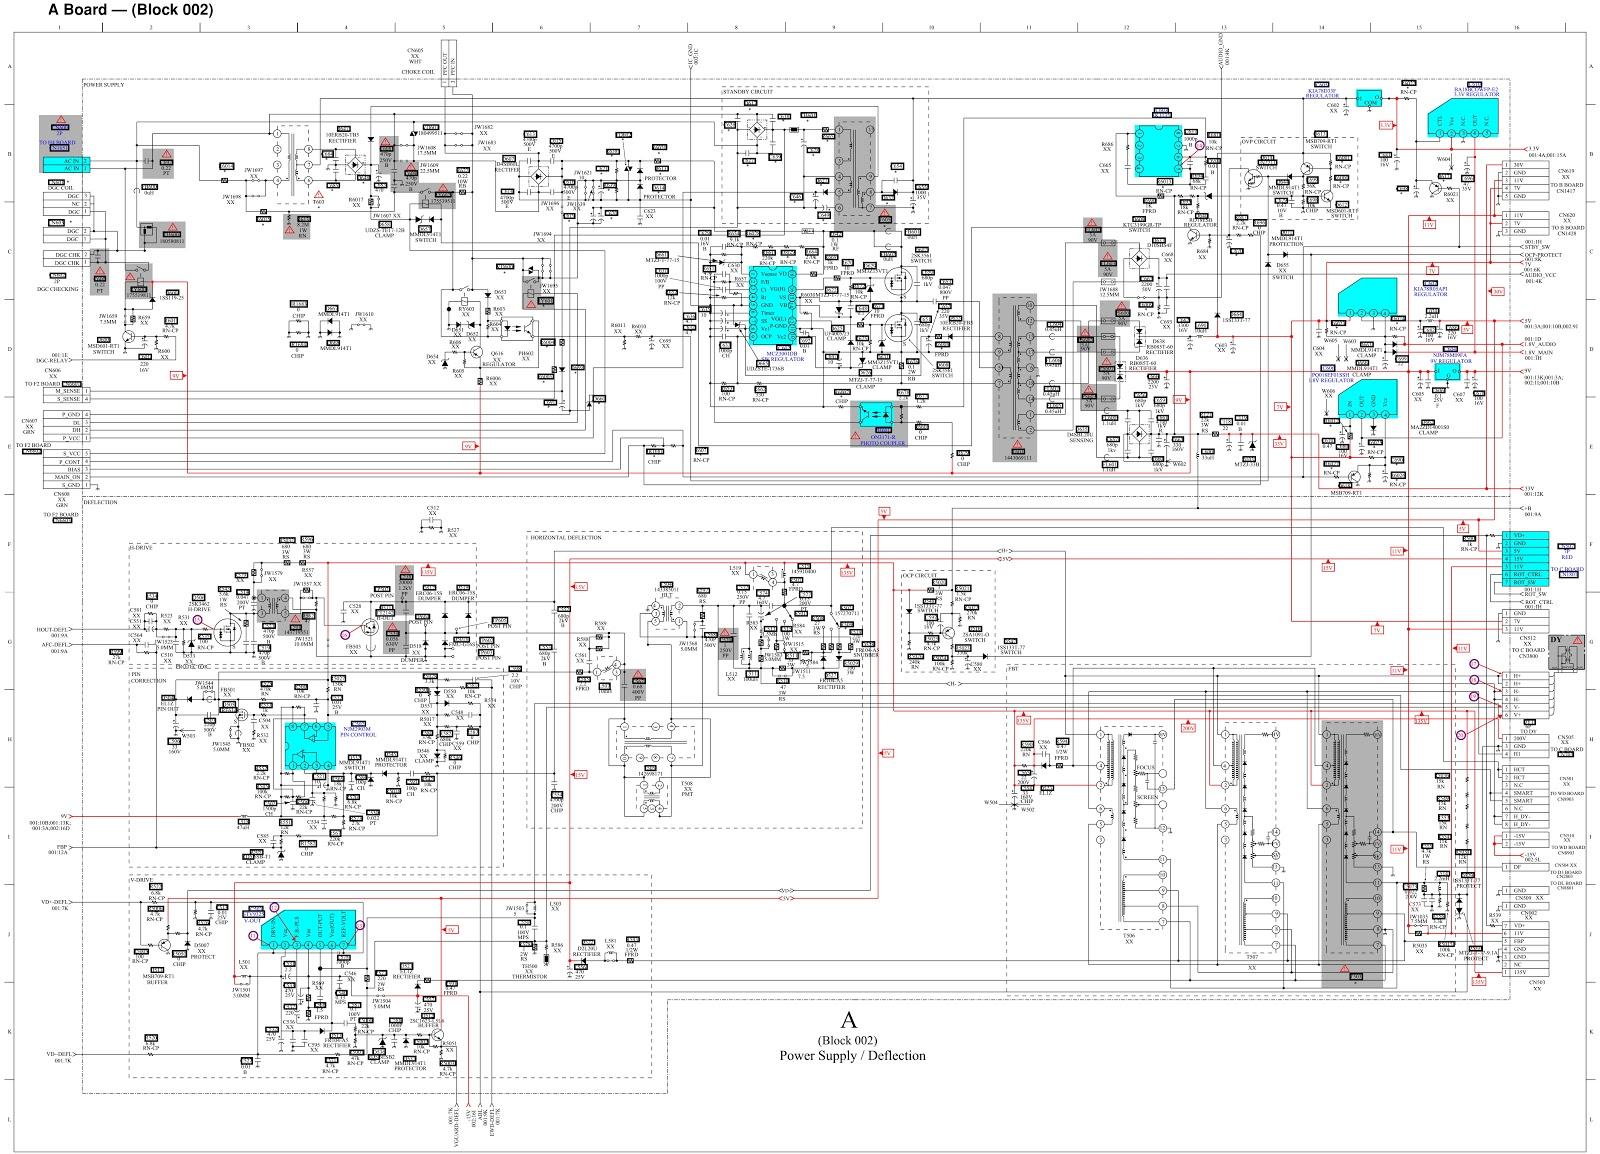 medium resolution of sony tv circuit diagram wiring diagram new lcd tv circuit diagram circuit diagrams free caroldoey